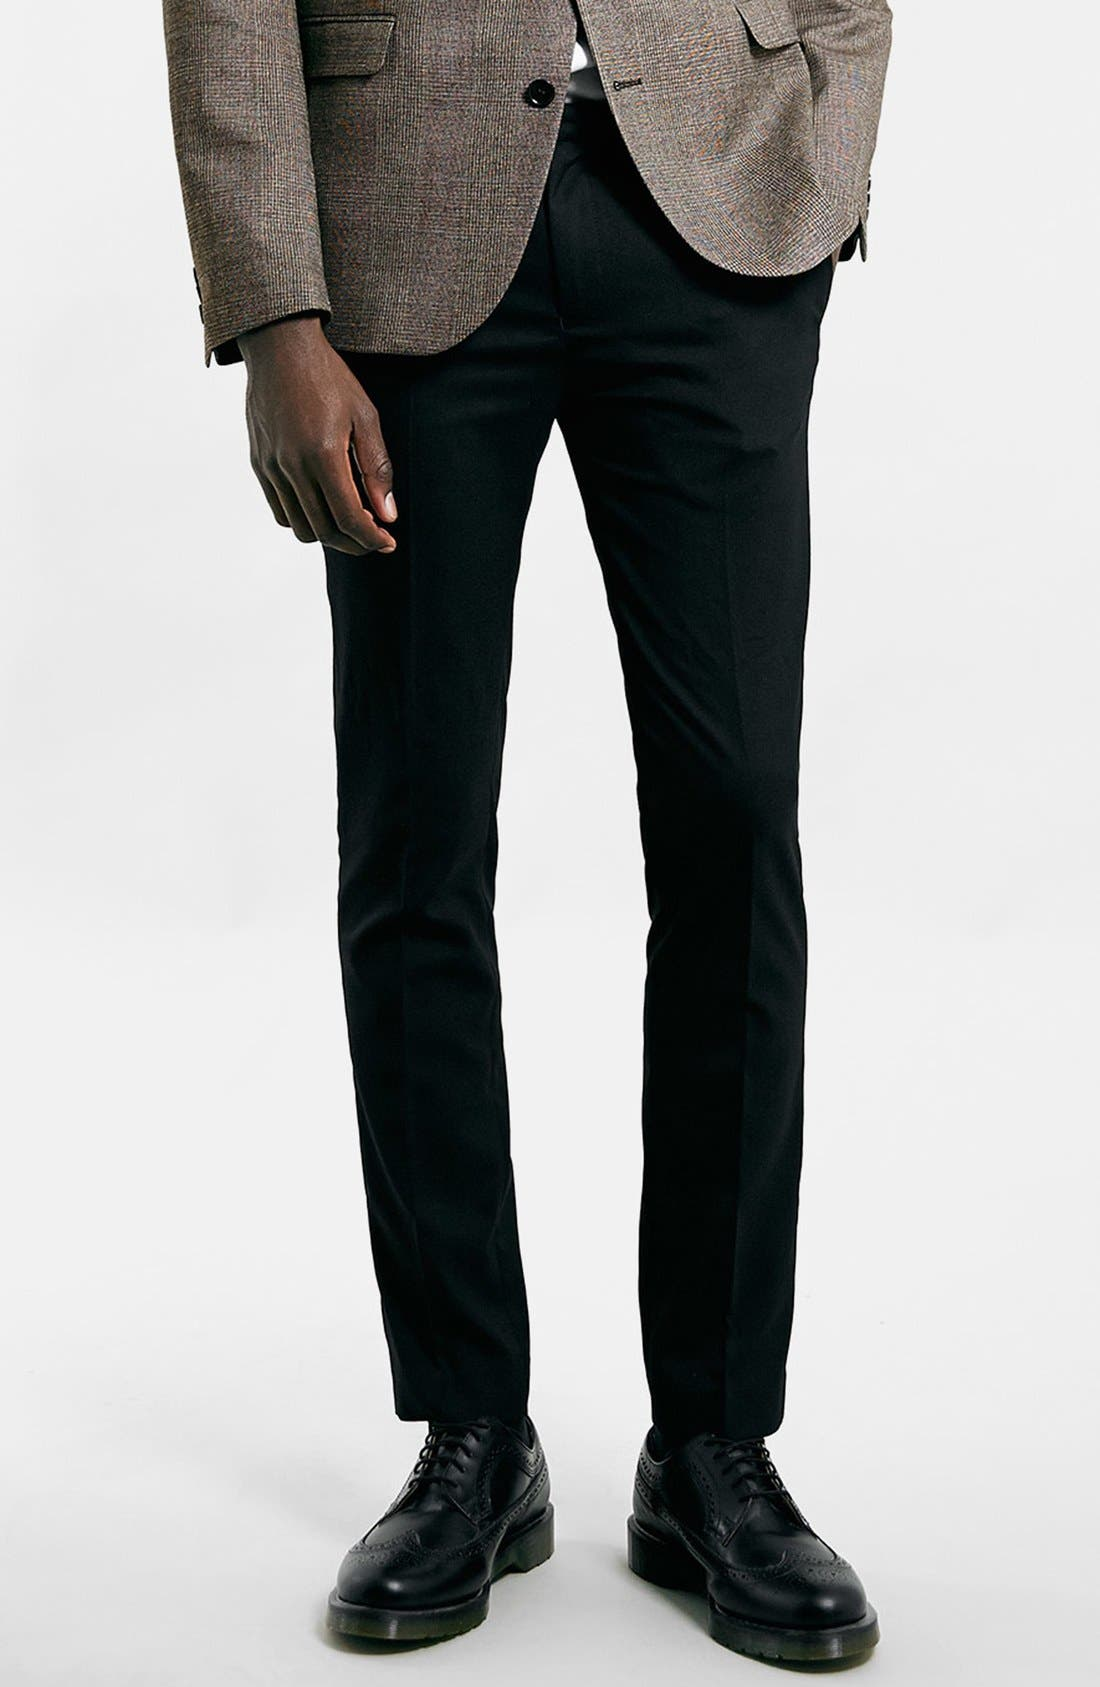 Ultra Skinny Black Suit Trousers,                             Main thumbnail 1, color,                             001